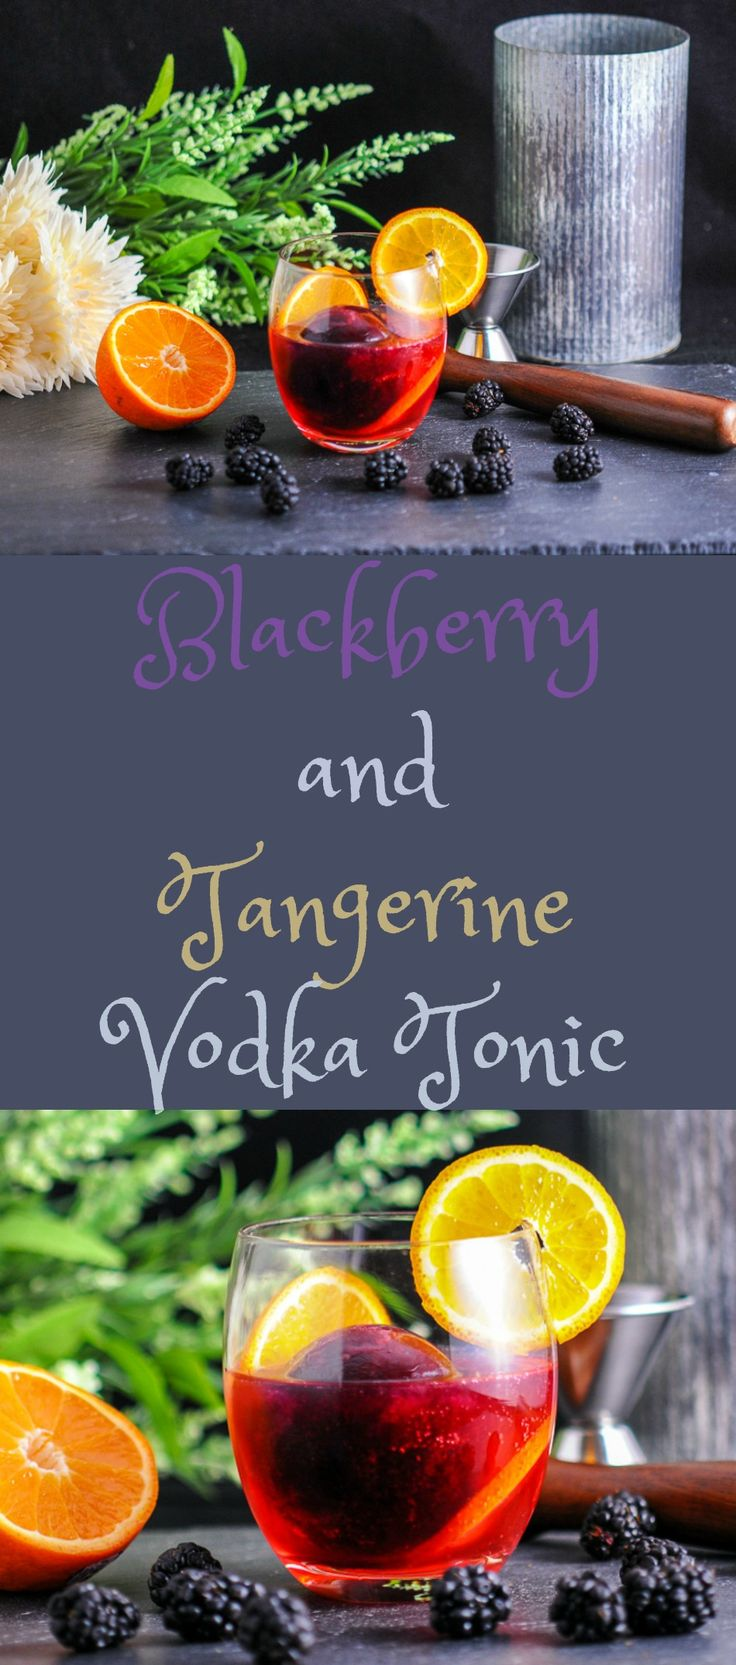 Blackberry and Tangerine Vodka Tonic cocktail - blackberry syrup iceball  #cocktail #blackberry #vodka #summer